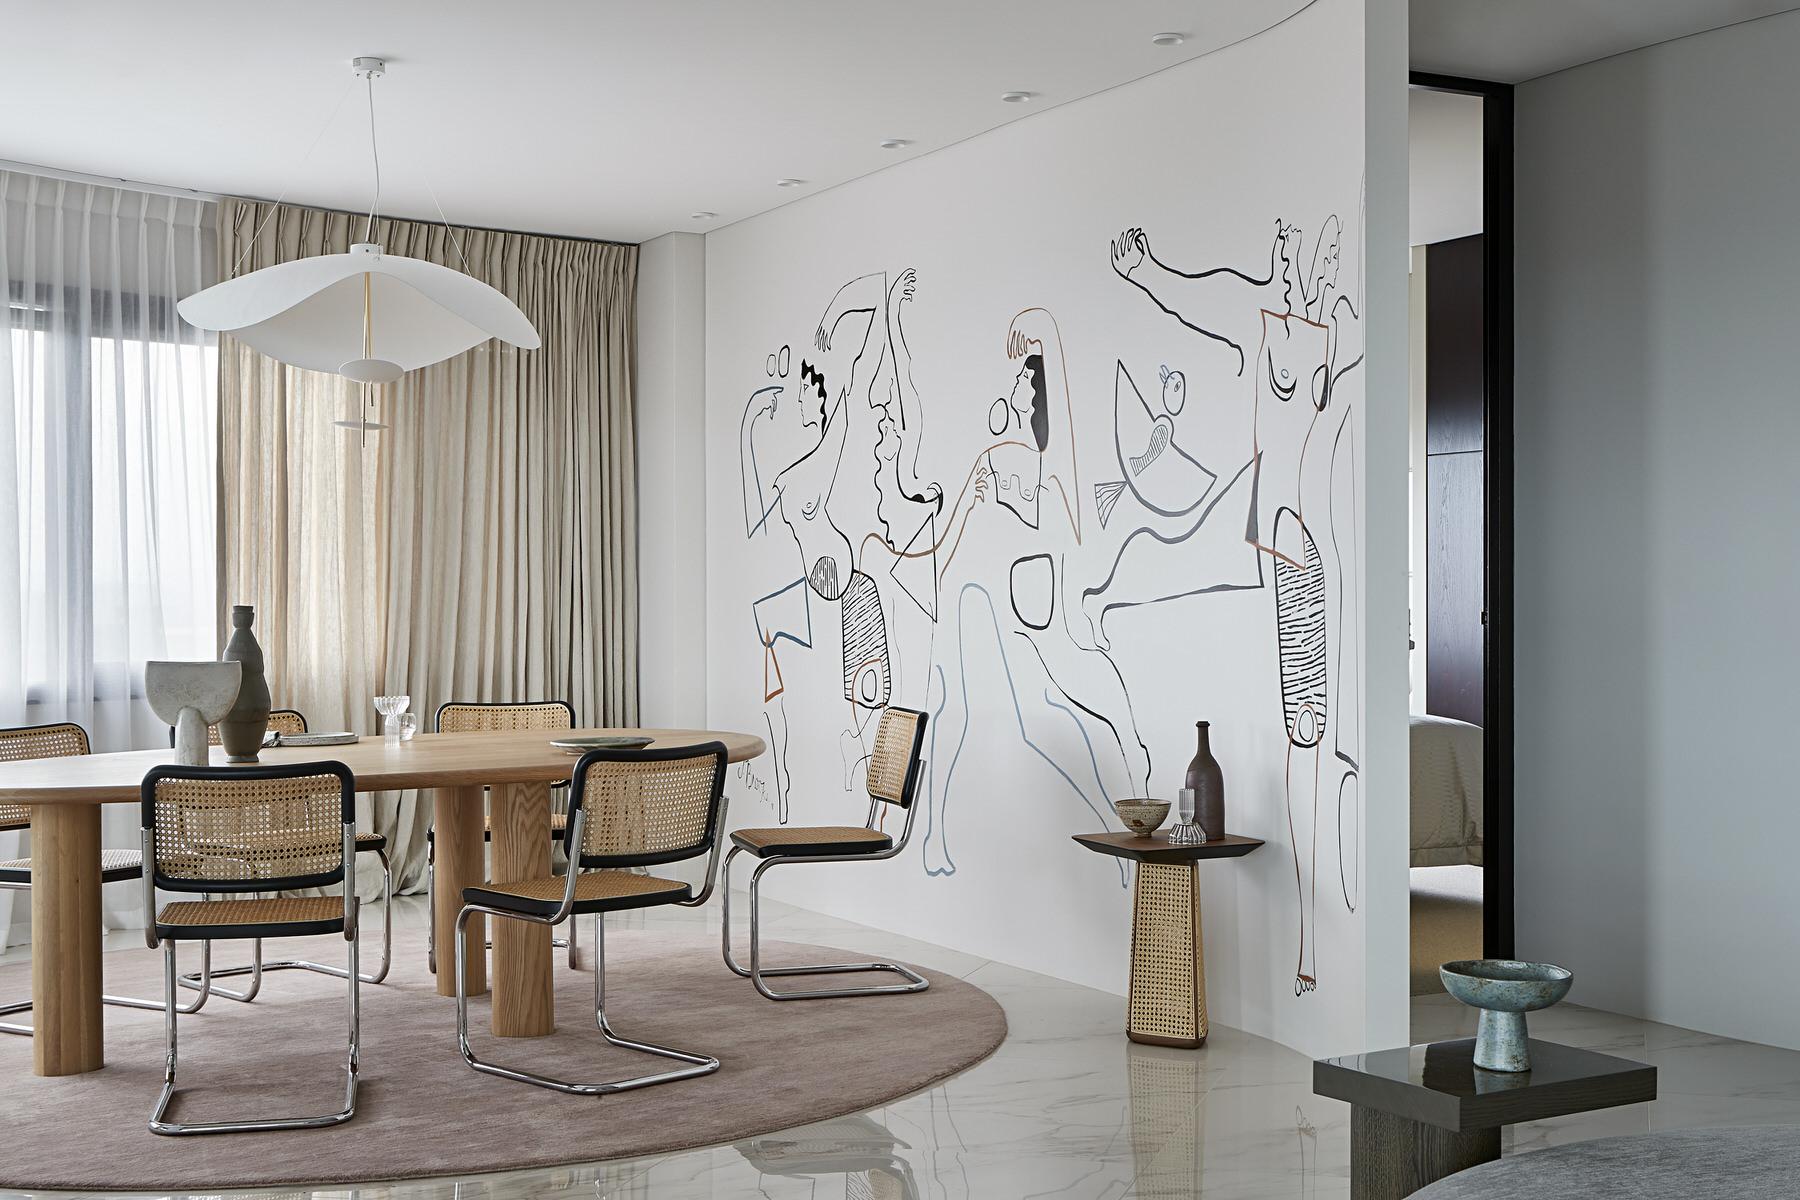 Avian Apartment Renovation Brisbane by Alicia Holgar, Australian Interior Architecture, Photo Shannon Mcgrath | Yellowtrace